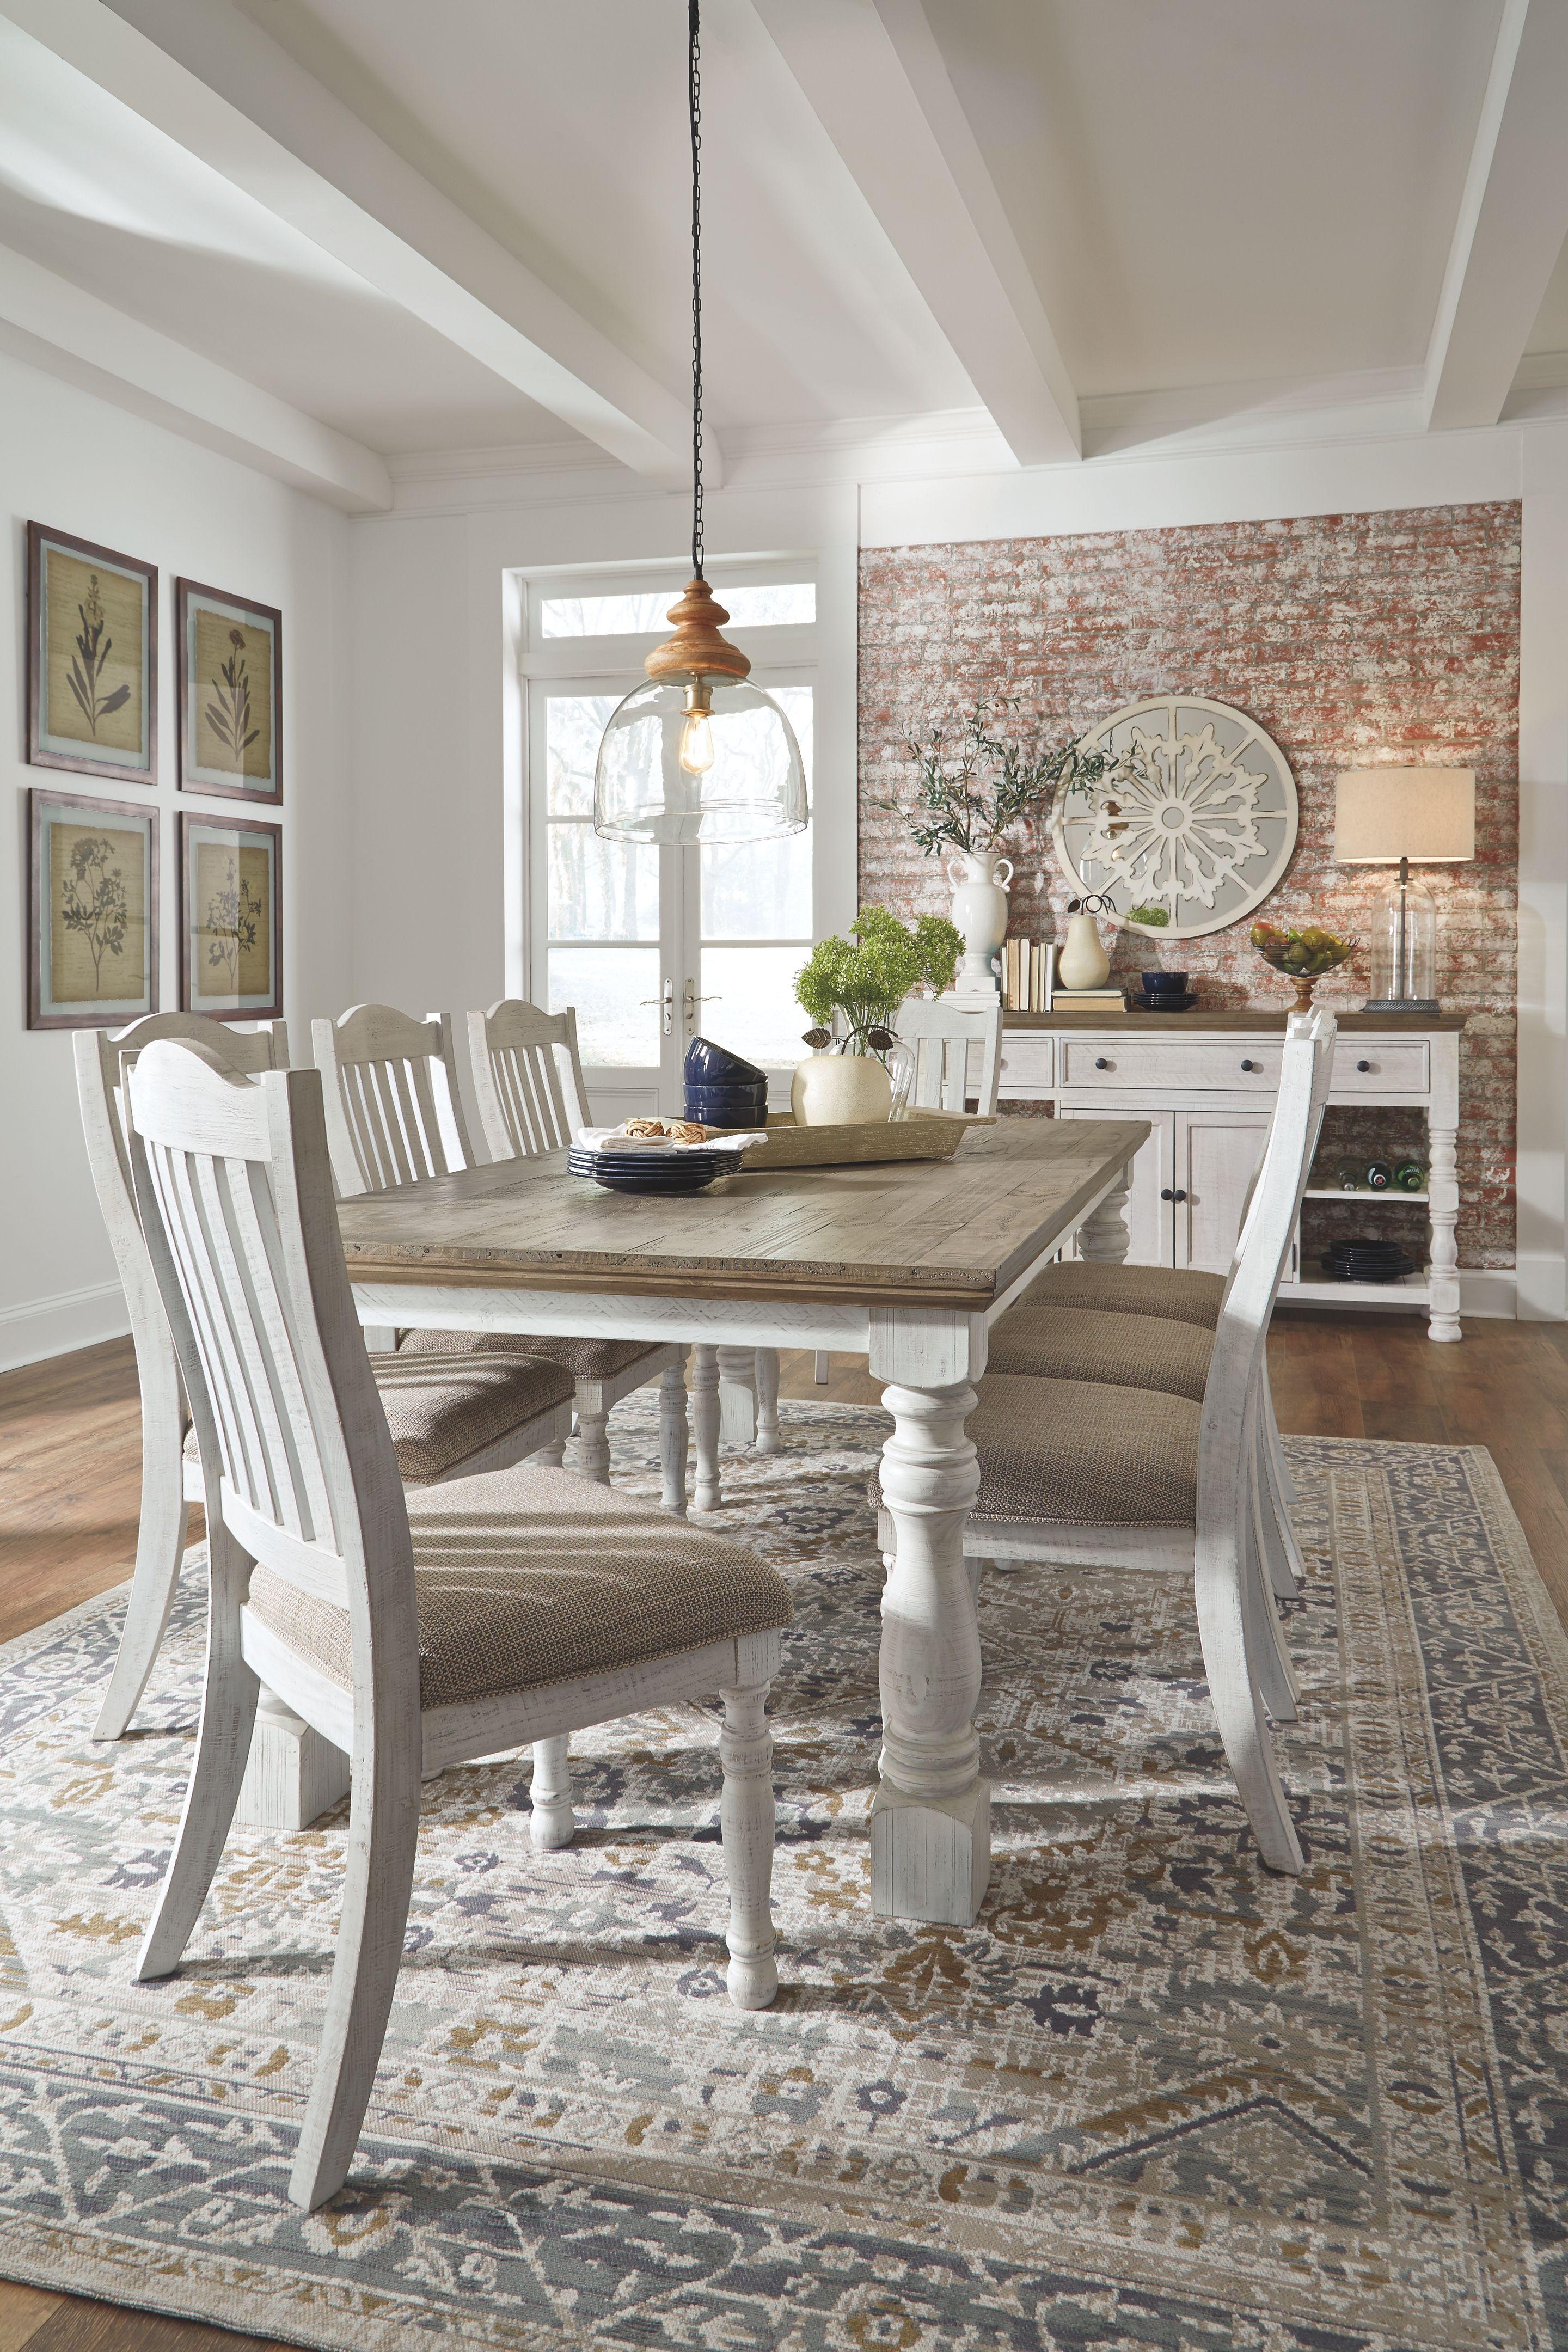 Havalance Dining Table Ashley Furniture Homestore Farmhouse Dining Room Table Farmhouse Style Dining Room Farmhouse Dining Room